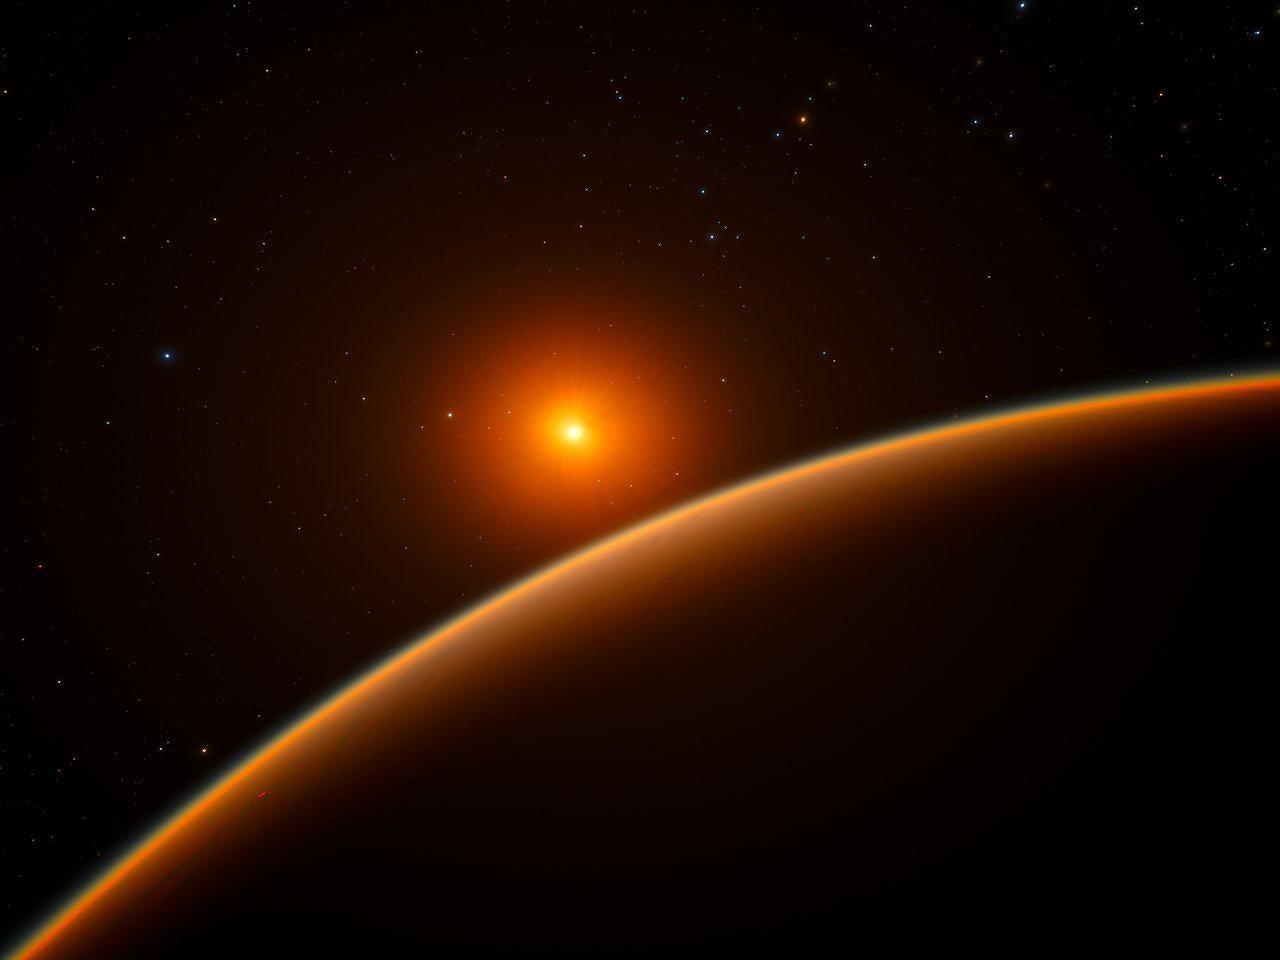 Nasa discovers 10 new 'rocky' planets like Earth